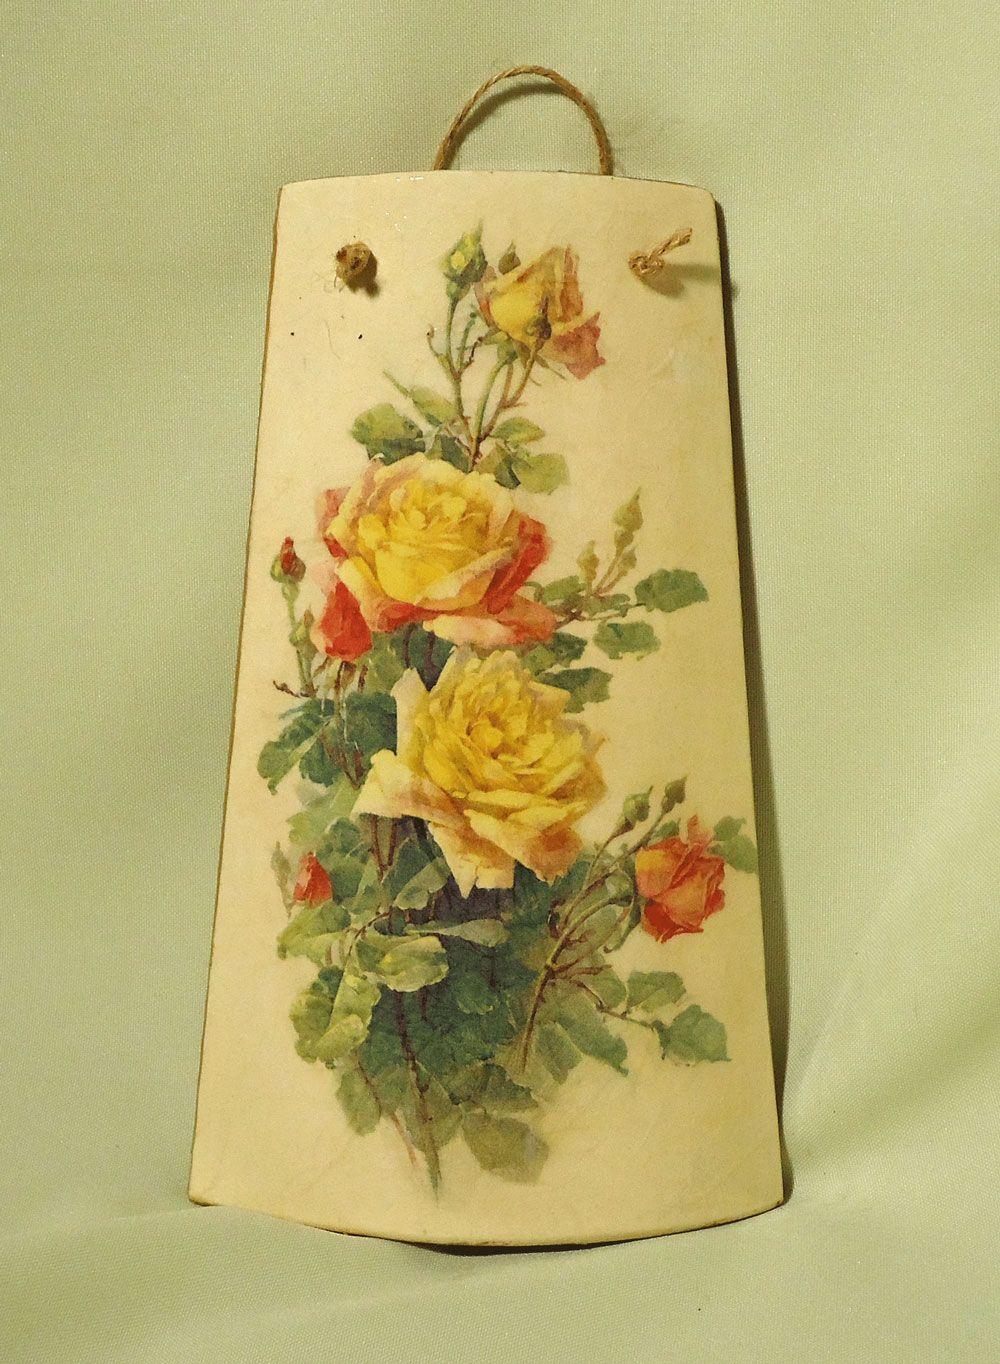 Tegola buchet de trandafiri de deco shop breslo tejas decoradas roof tiles decoupage art - Pintar tejas de barro ...